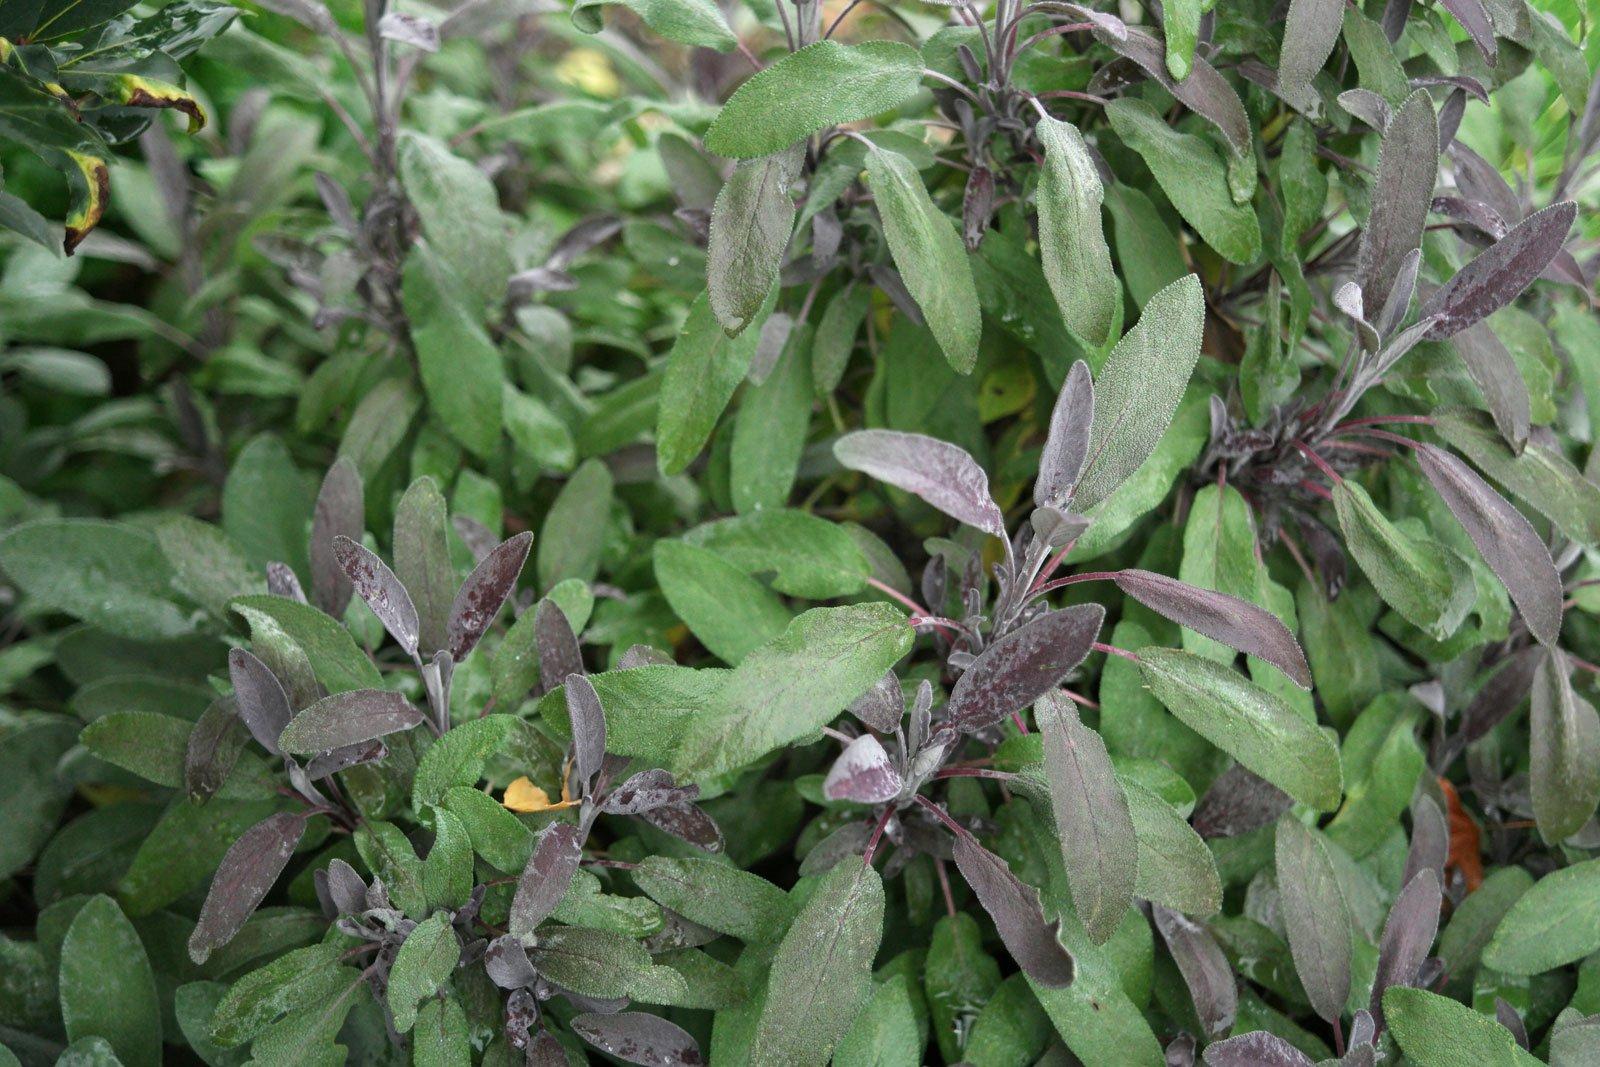 Salvia officinalis Purpurascens